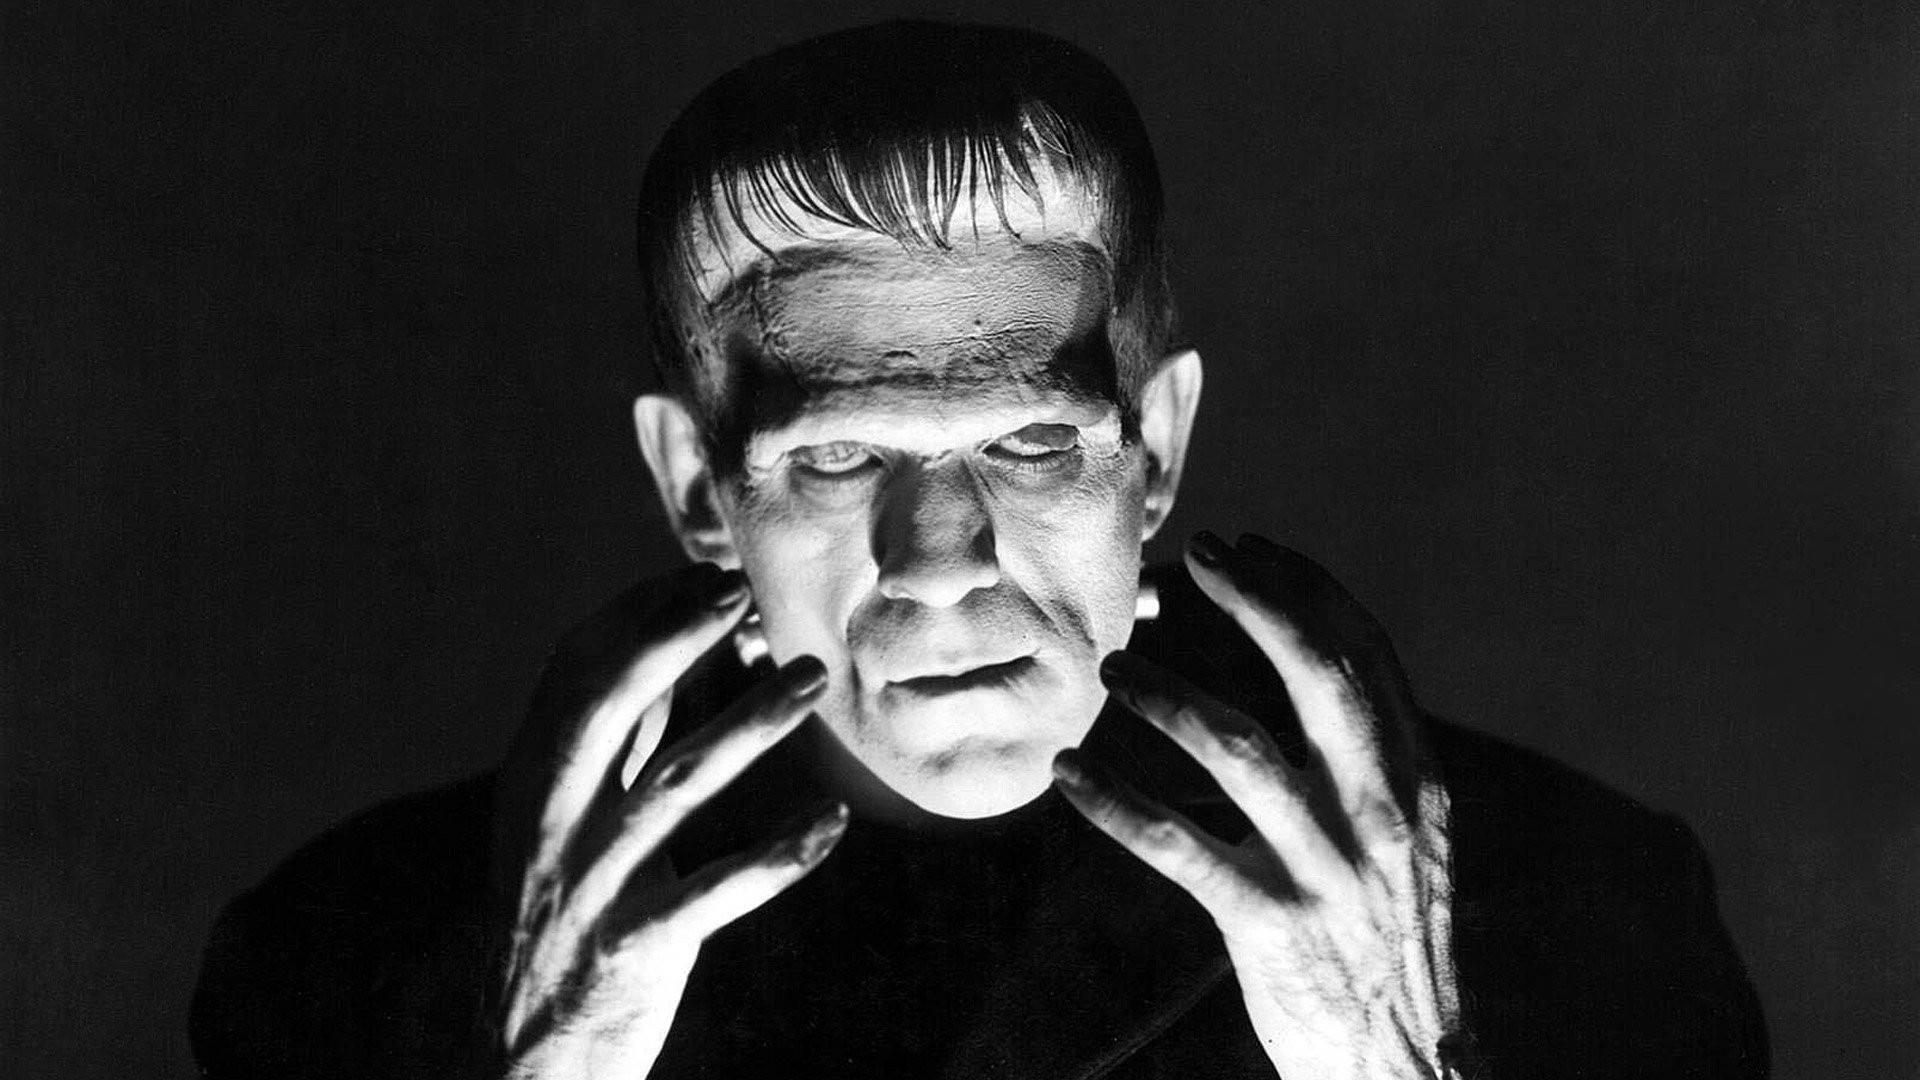 Boris Karloff as Frankenstein's Monster in Frankenstein (1931) | Photo: Universal Pictures